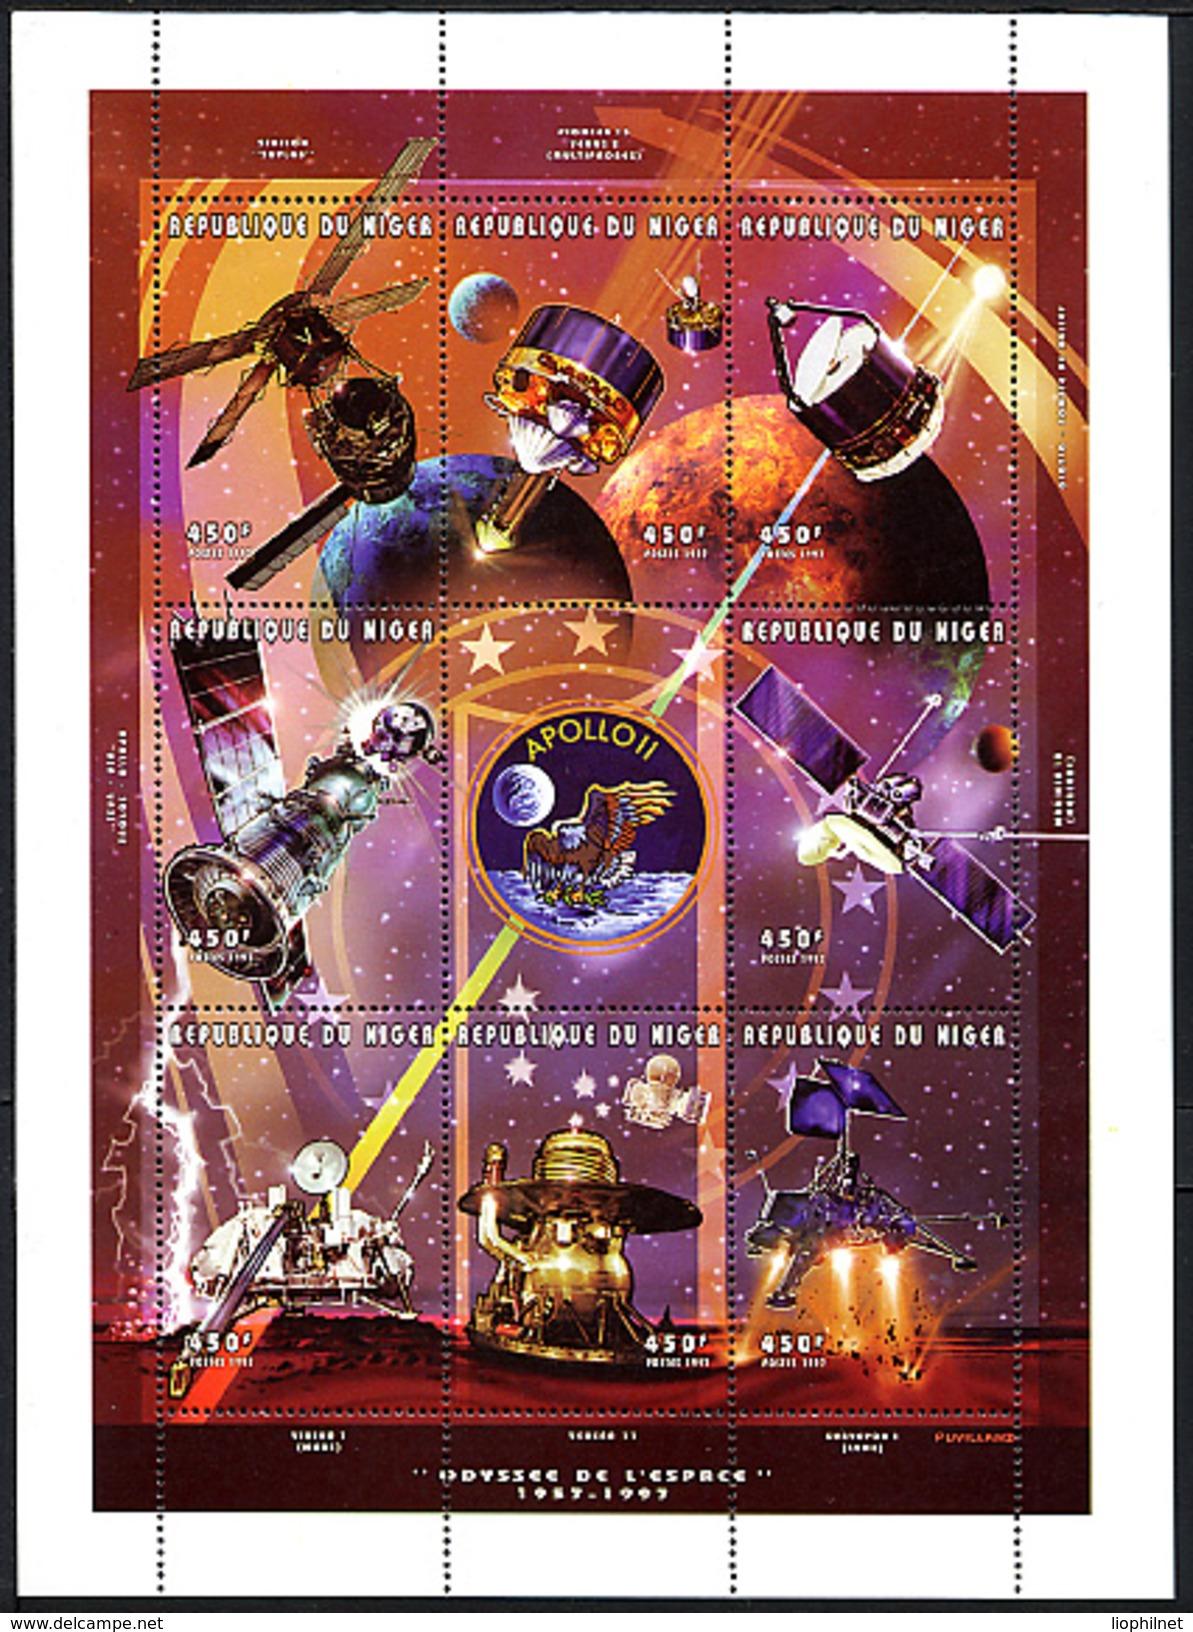 NIGER 1997, Espace Skylab Apollo-Soyouz Mariner 10 Venera II..., Feuillet 8 Valeurs, Neuf / Mint. R417 - Space